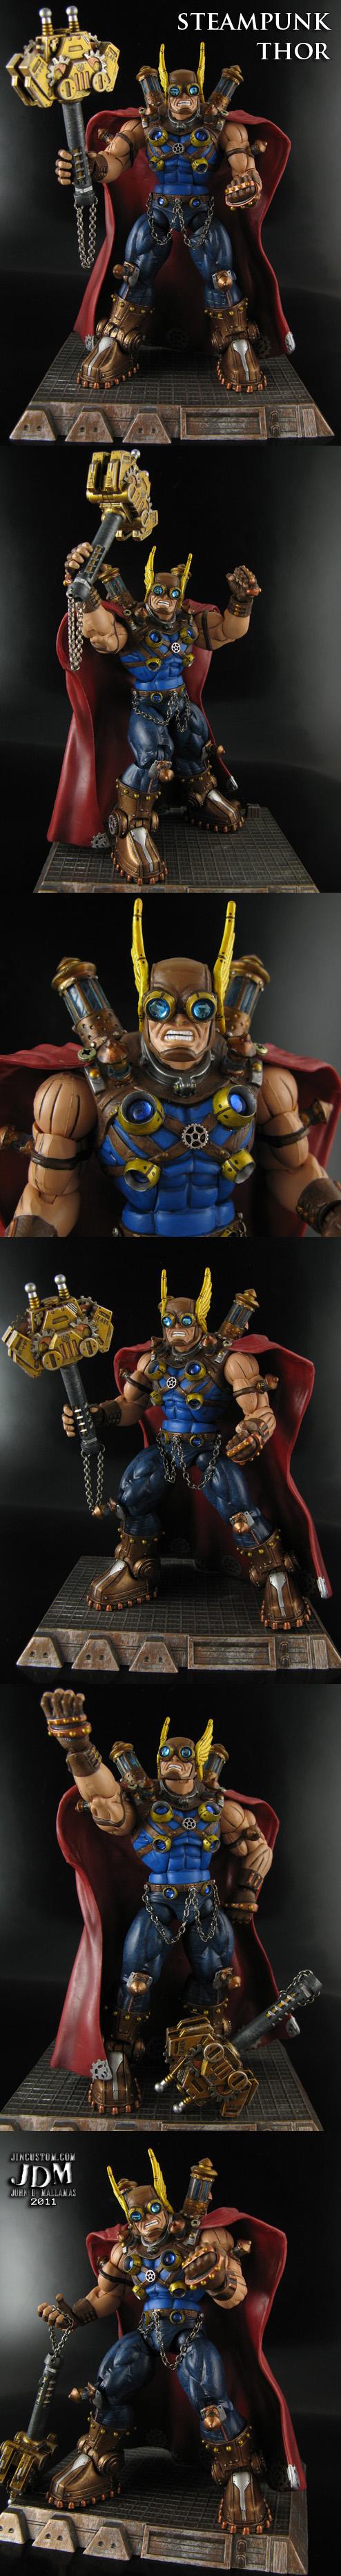 Steampunk Thor